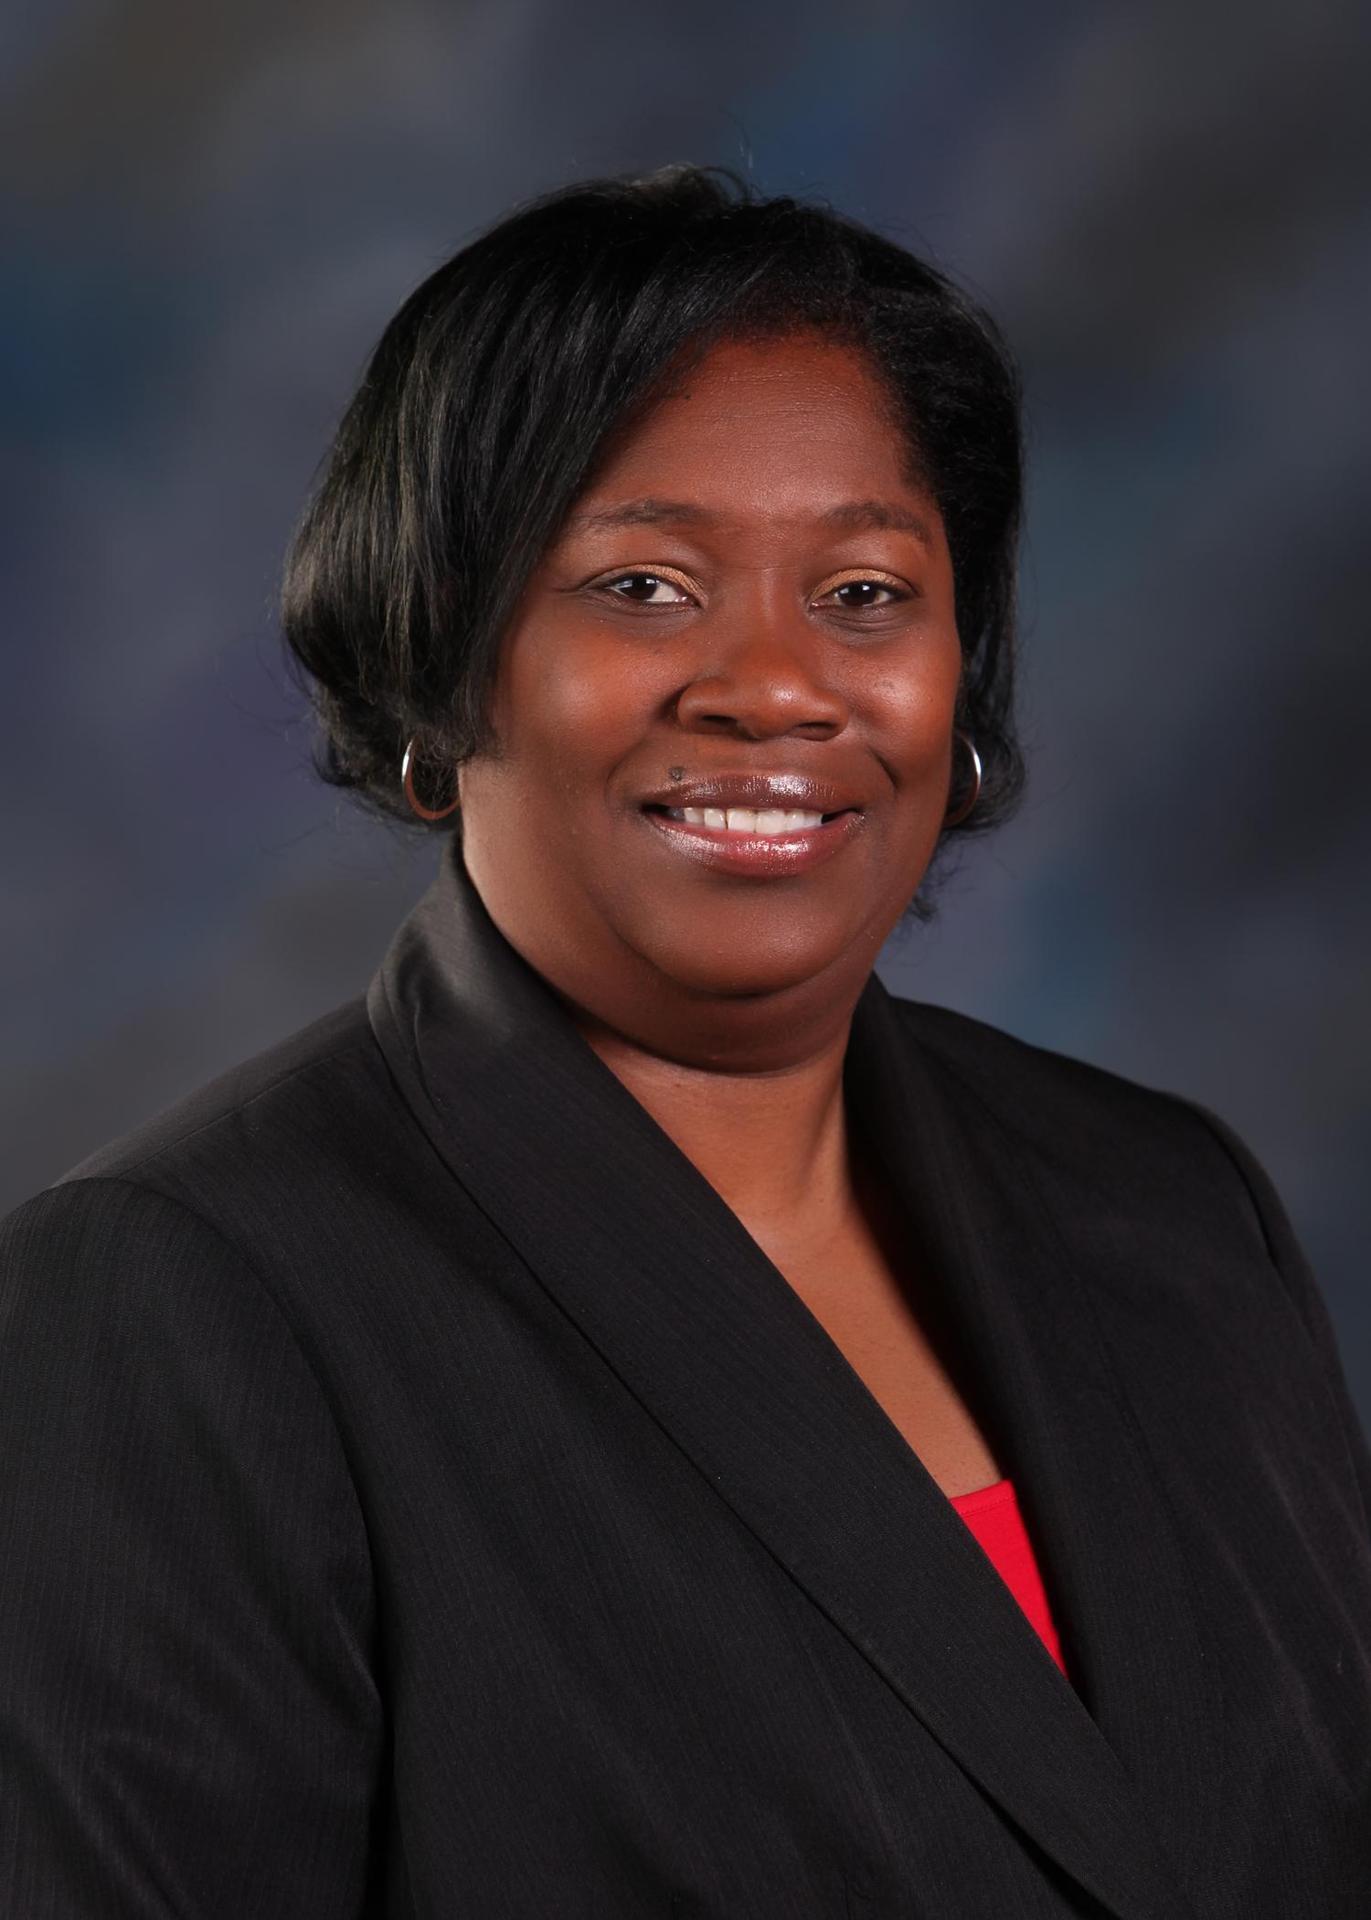 Mrs. Felicia Thomas, Principal